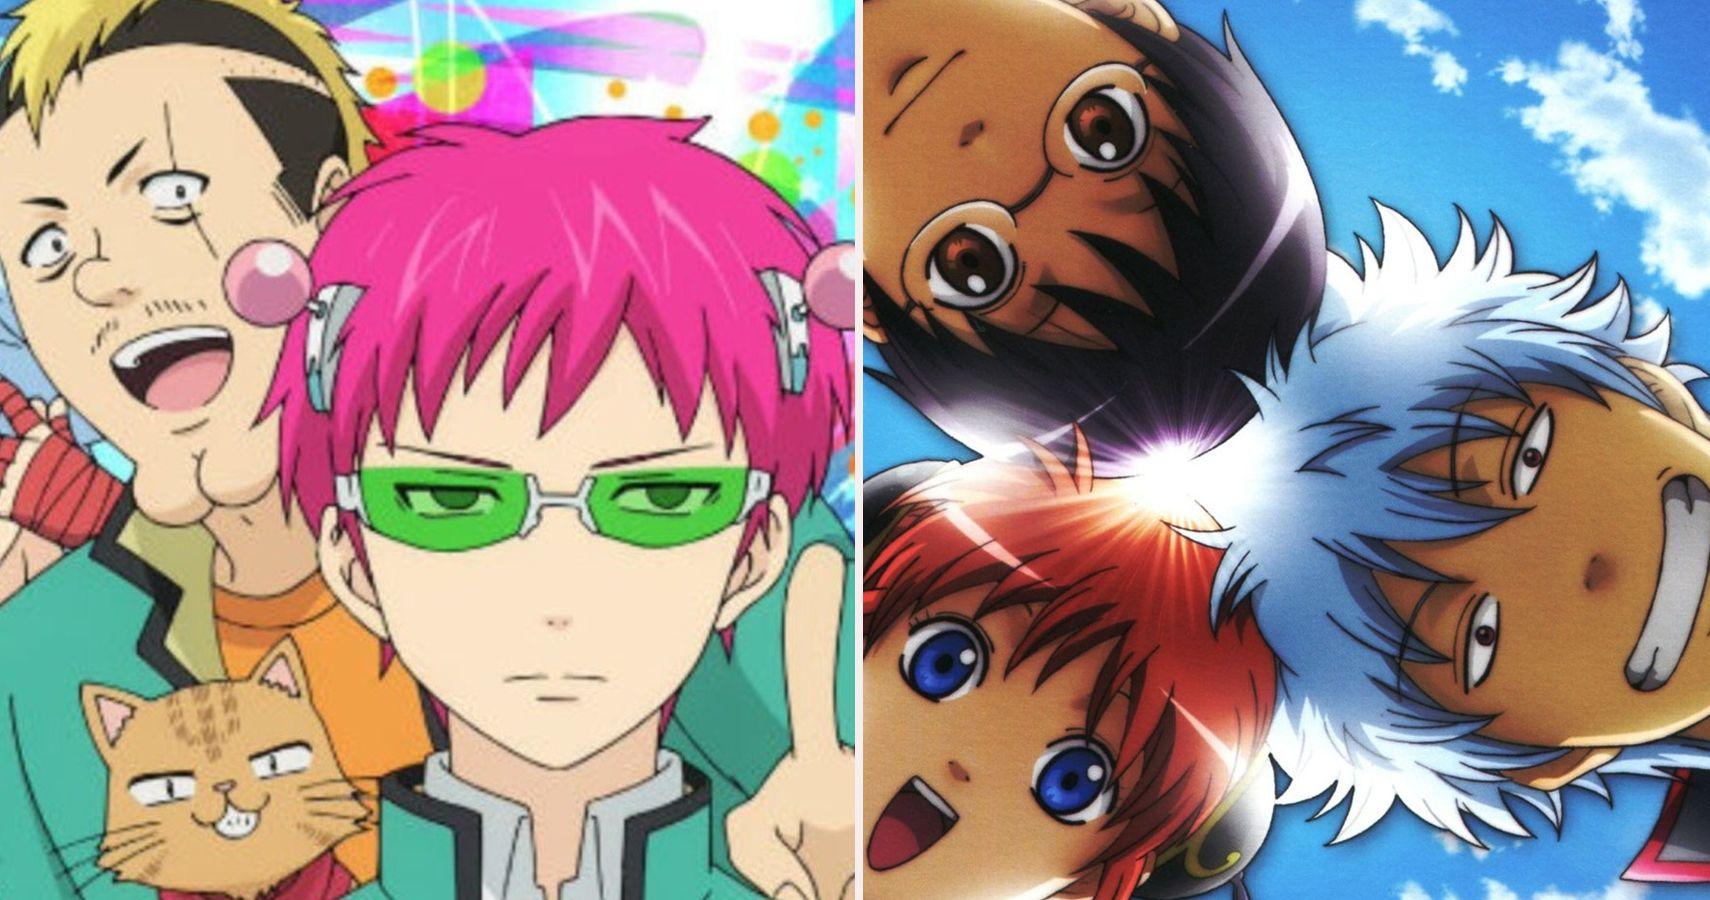 10 Most Popular Anime of 2018 (according to MyAnimeList) | CBR